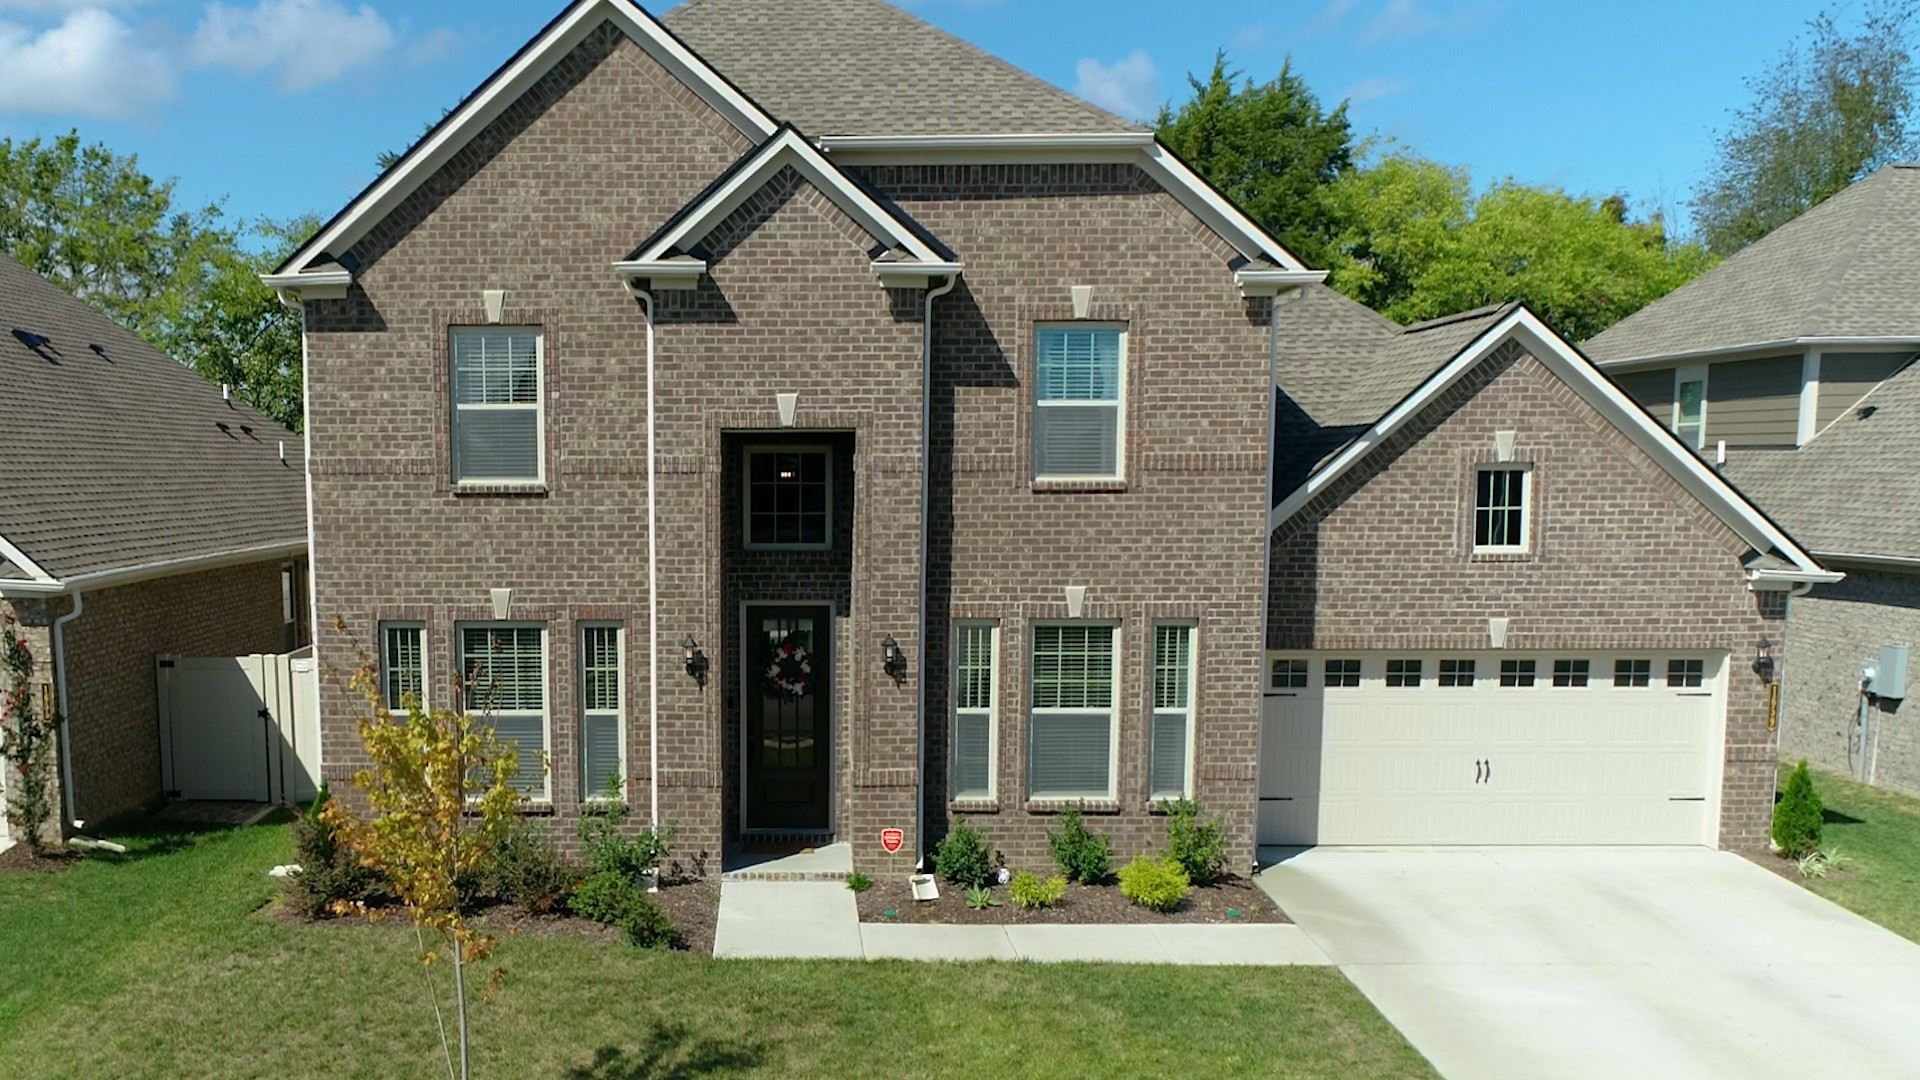 1659 Burrows Ave, Murfreesboro, TN 37129 - MLS#: 2291664